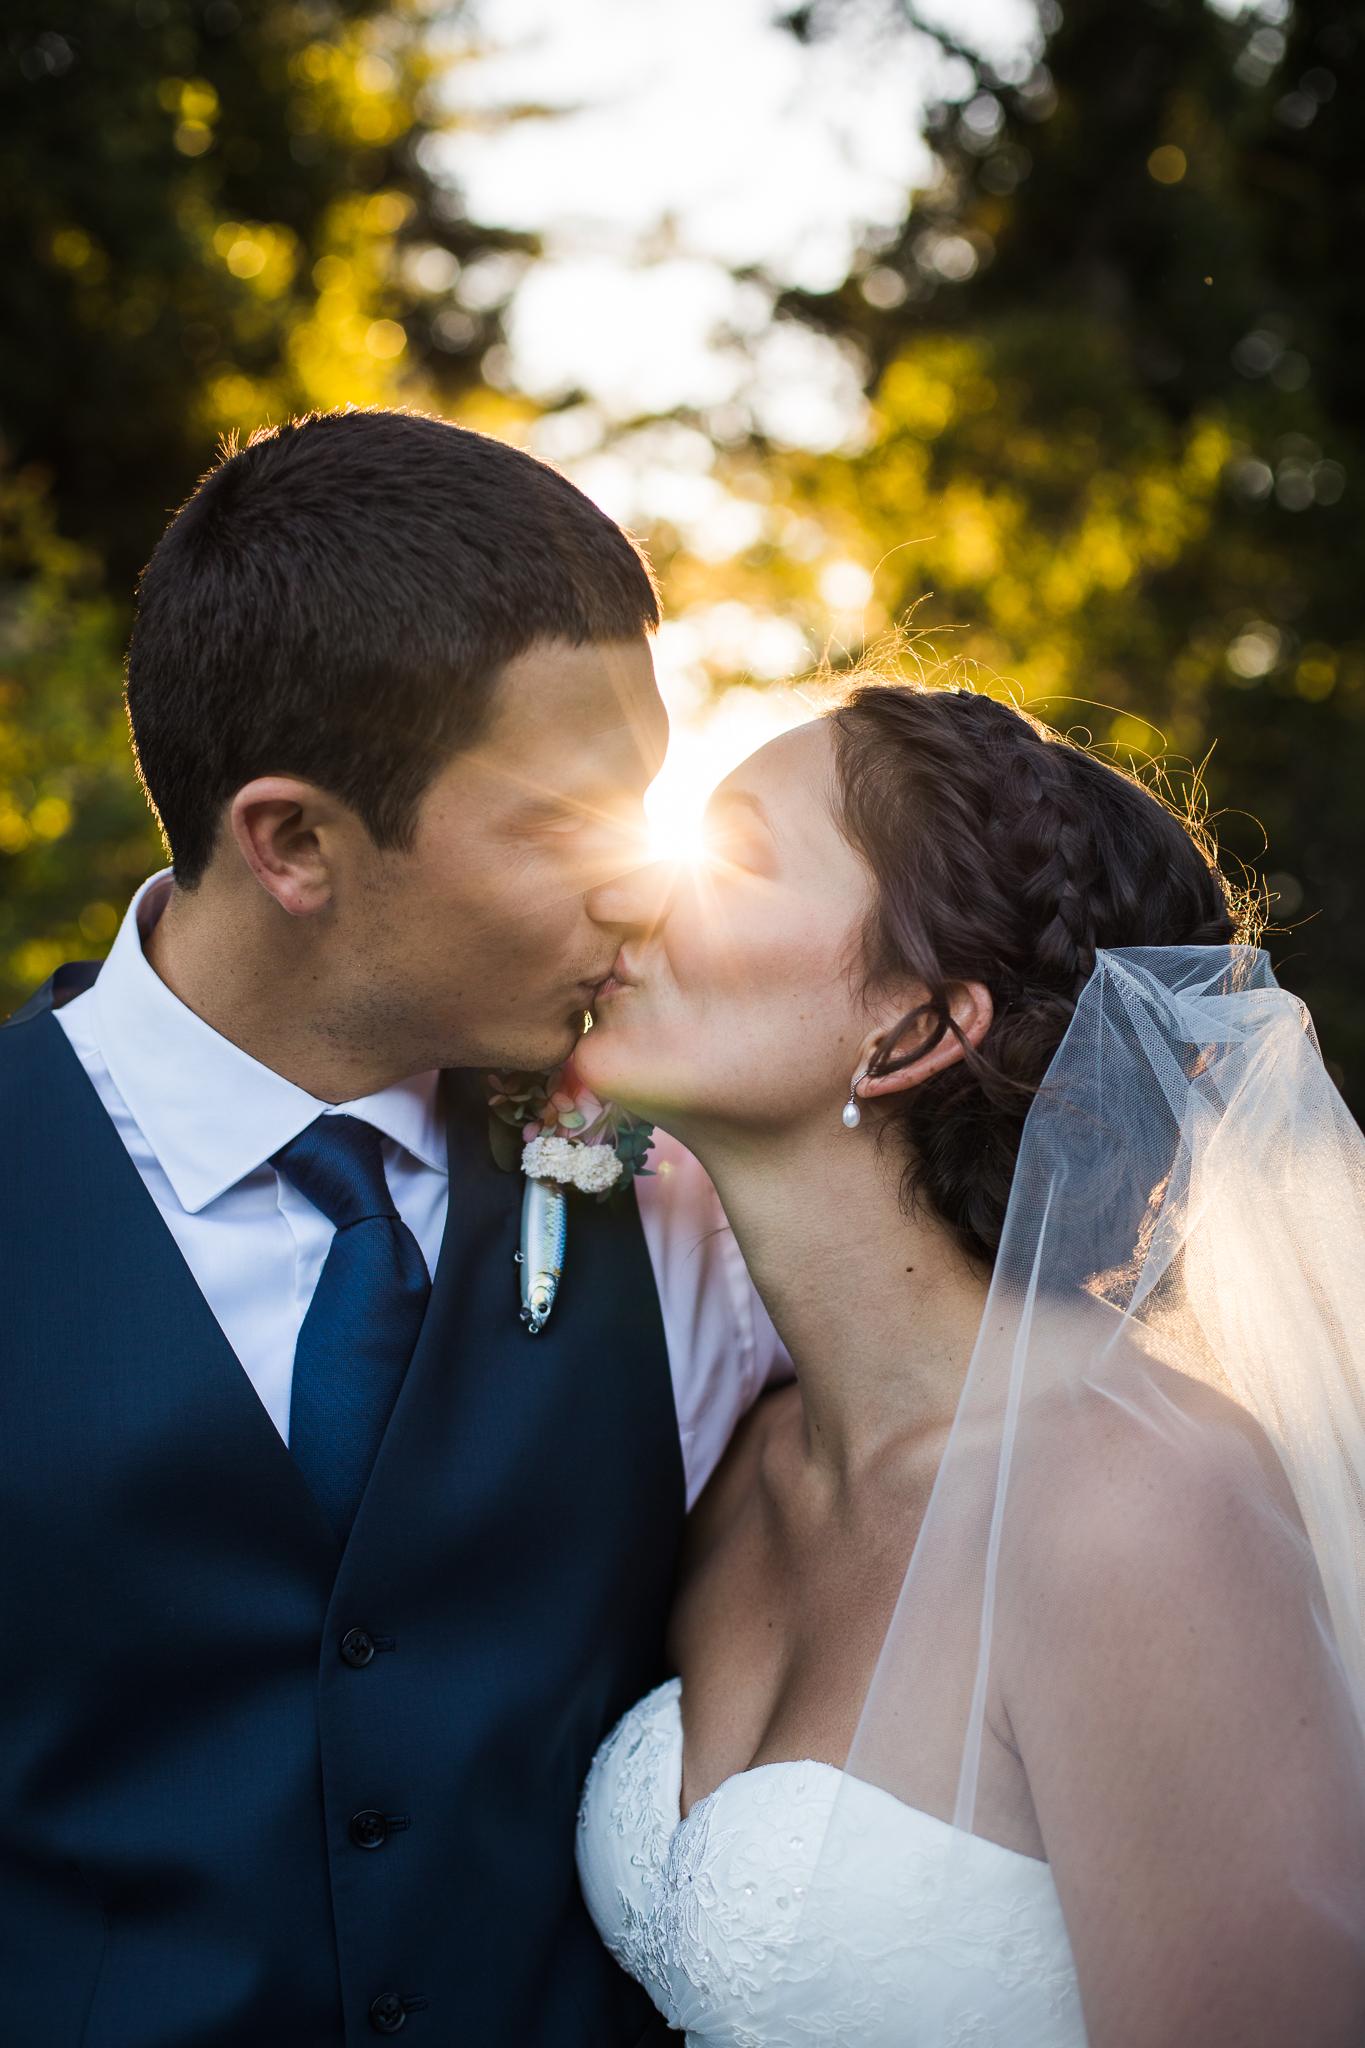 Archer_Inspired_Photography_Rando_wedding_Soquel_California-1.jpg